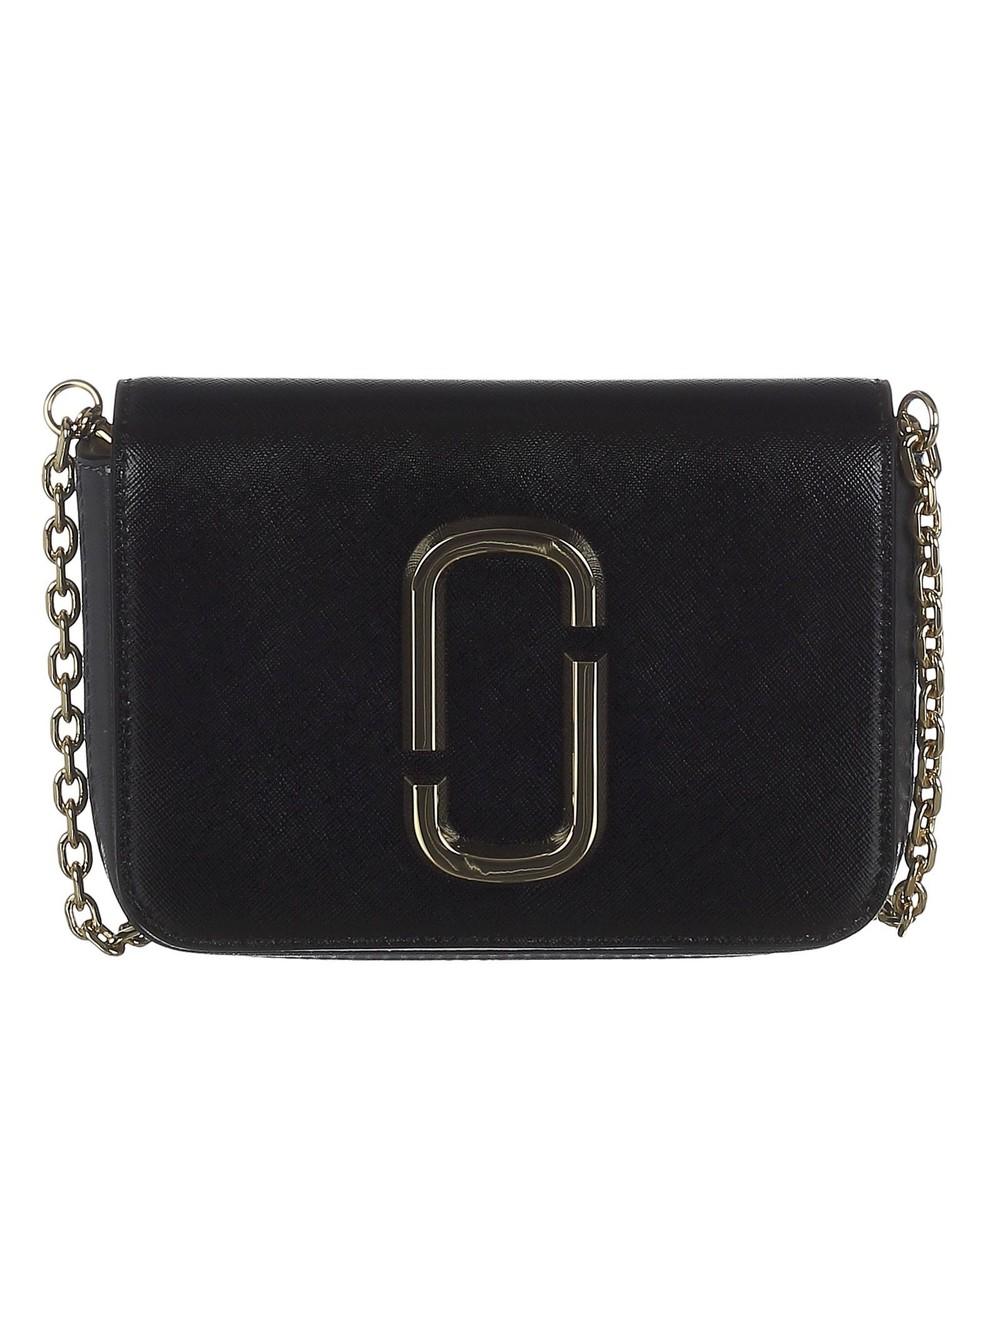 Marc Jacobs Double J Logo Belt Bag in black / multi